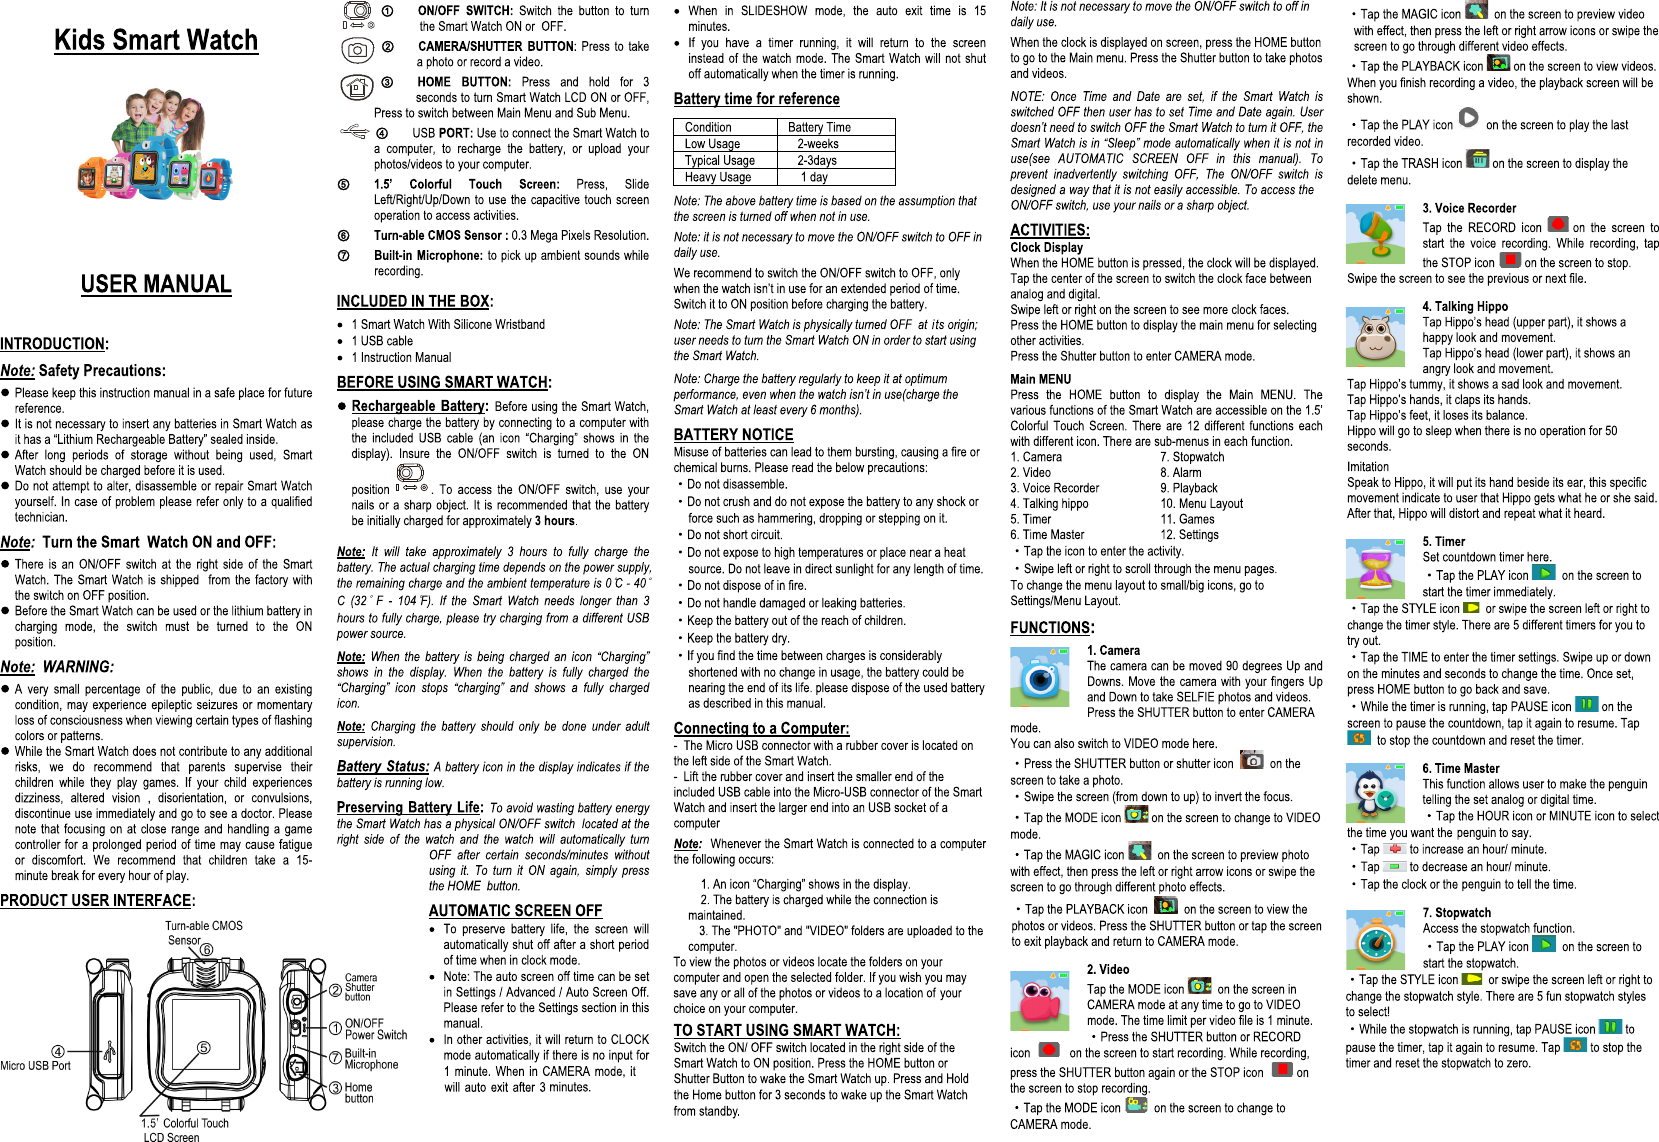 Sharper Image KIDS SMART WATCH MANUAL A4 new 6 206196